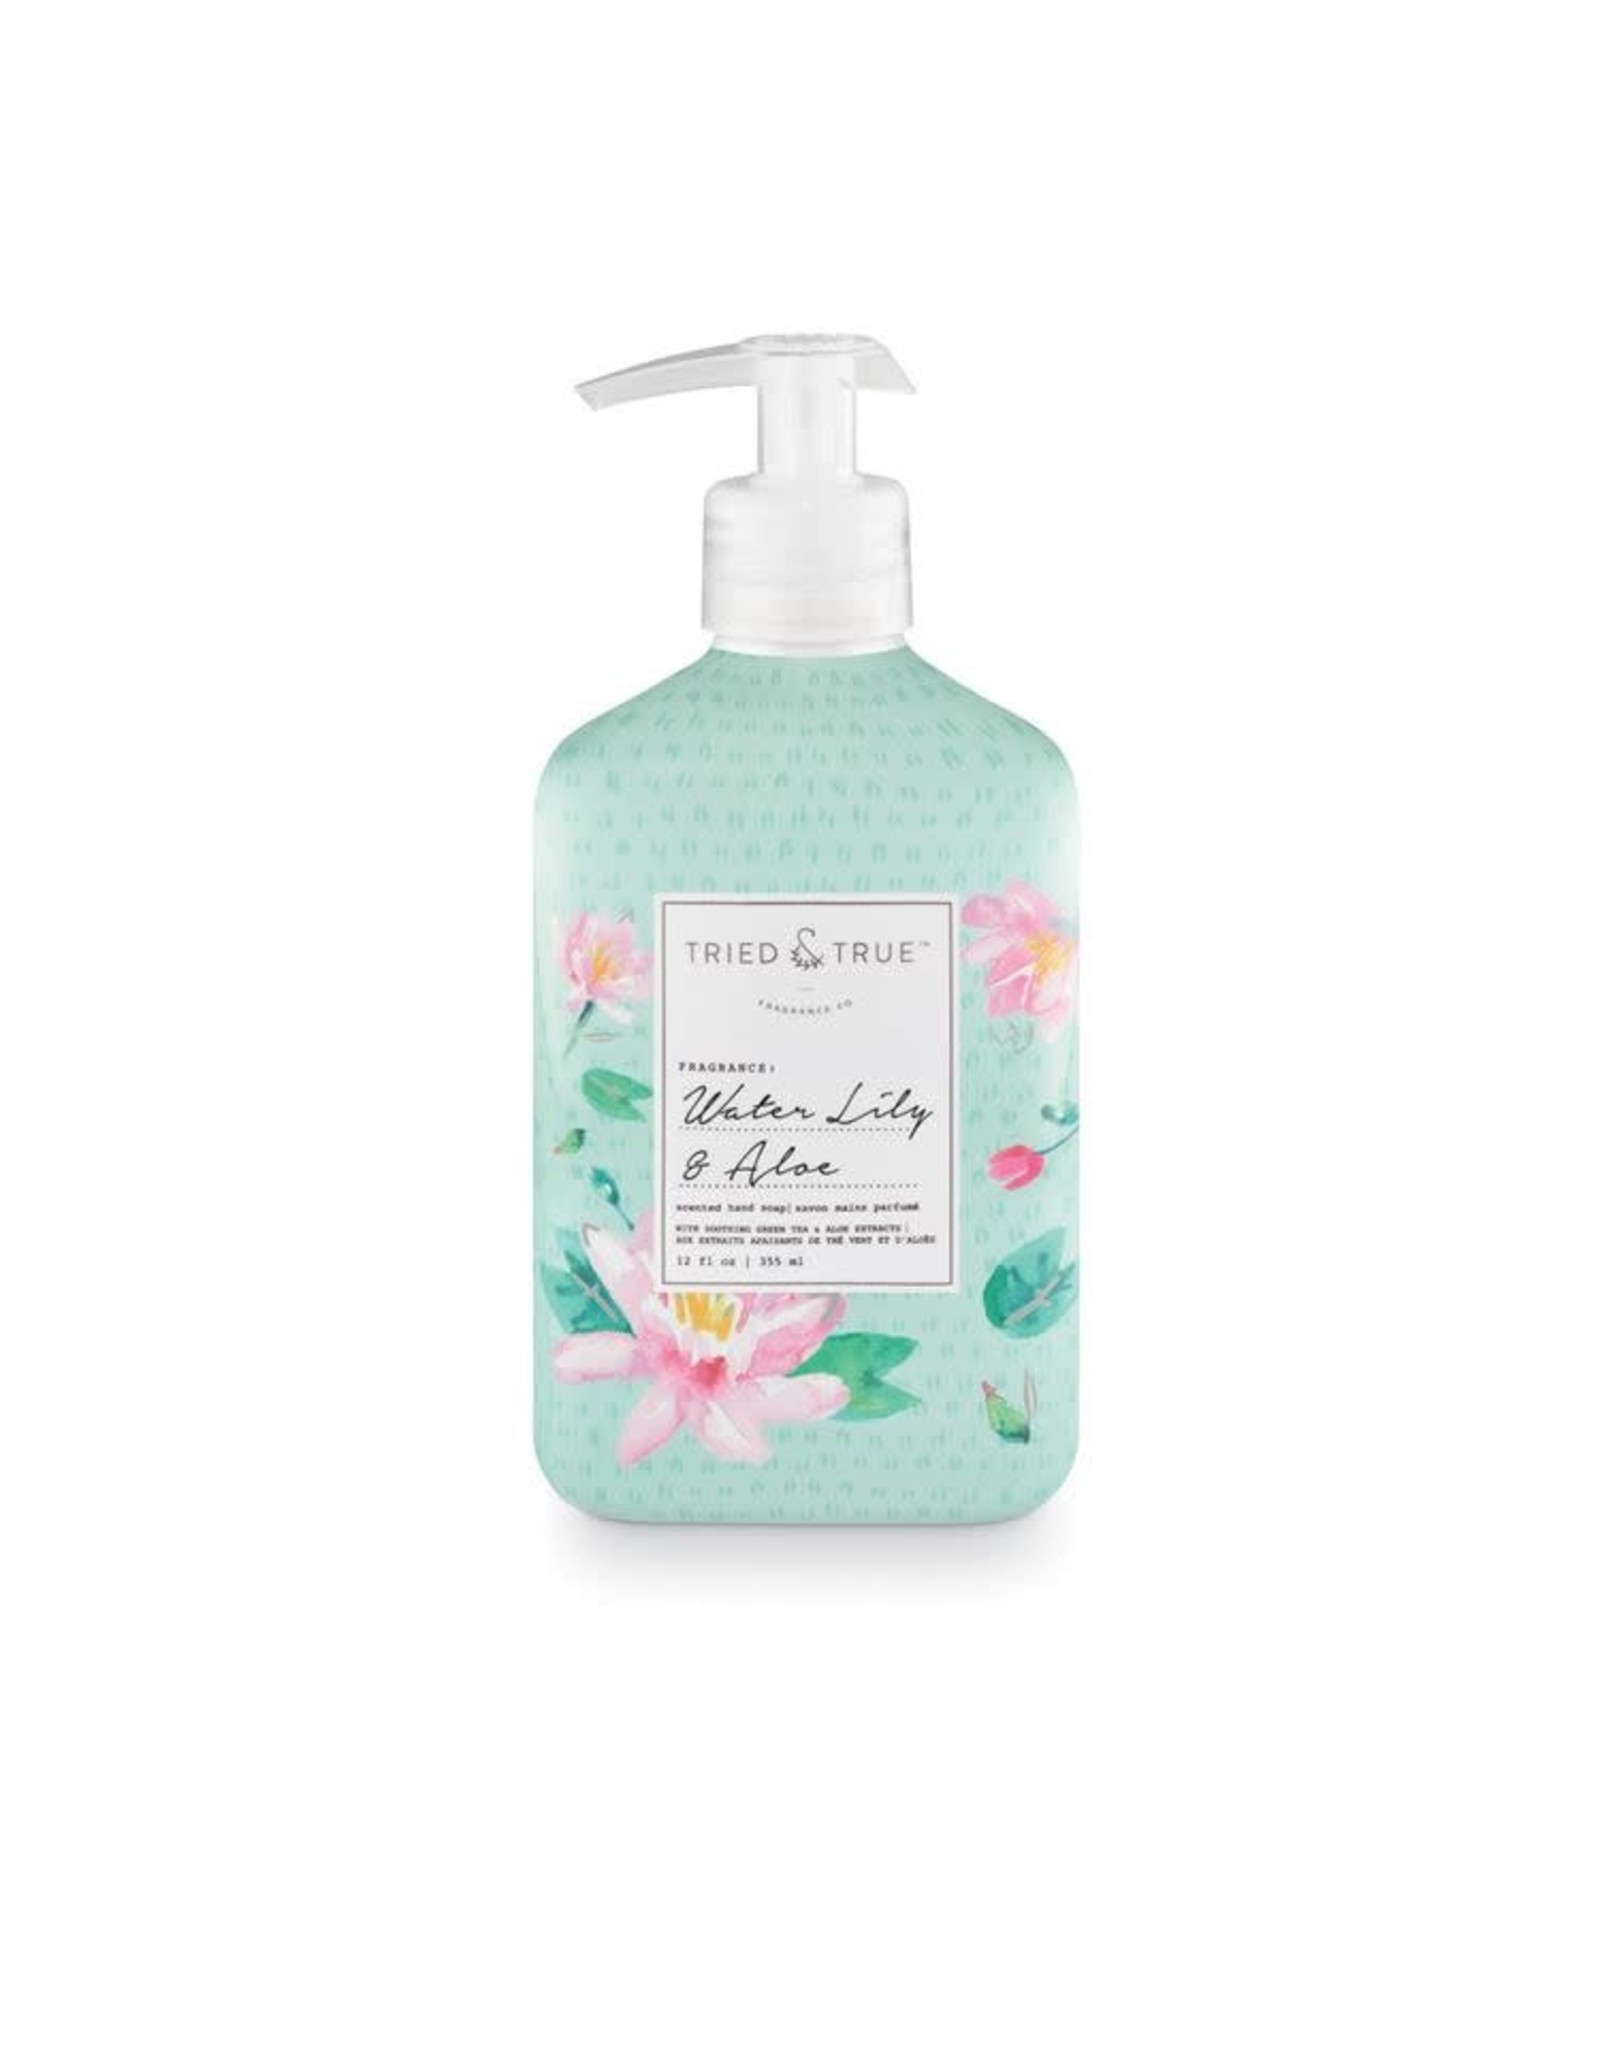 Tried & True 12 oz Hand Wash - Water Lily & Aloe